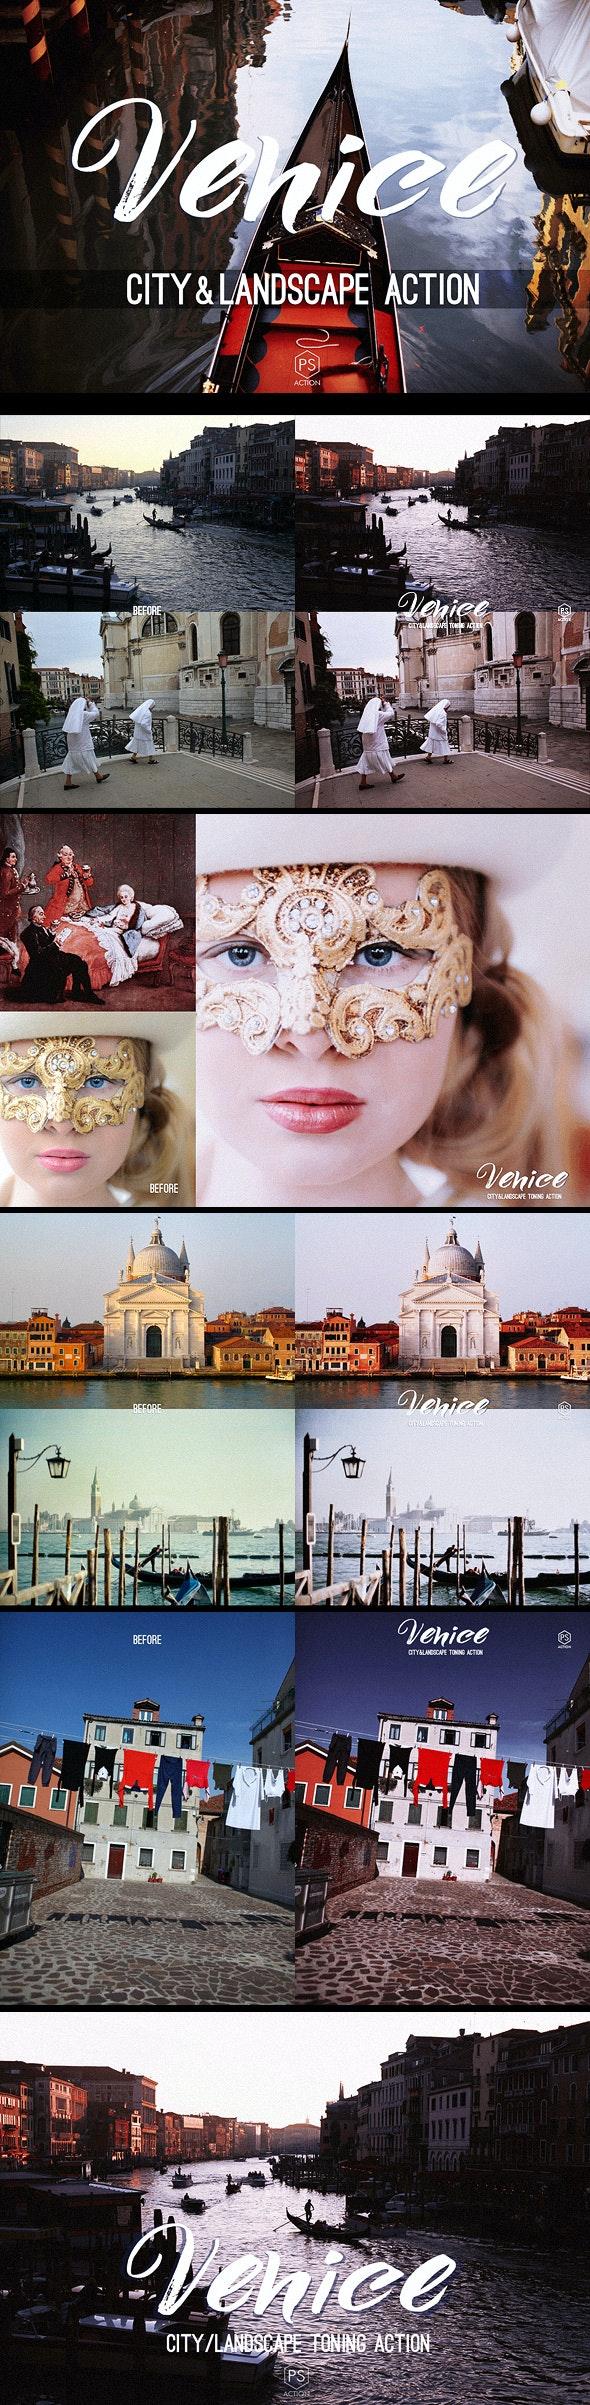 Venice Landscape Photoshop Action - atmospheric toning for urban, cityscape & landscape photography - Photo Effects Actions